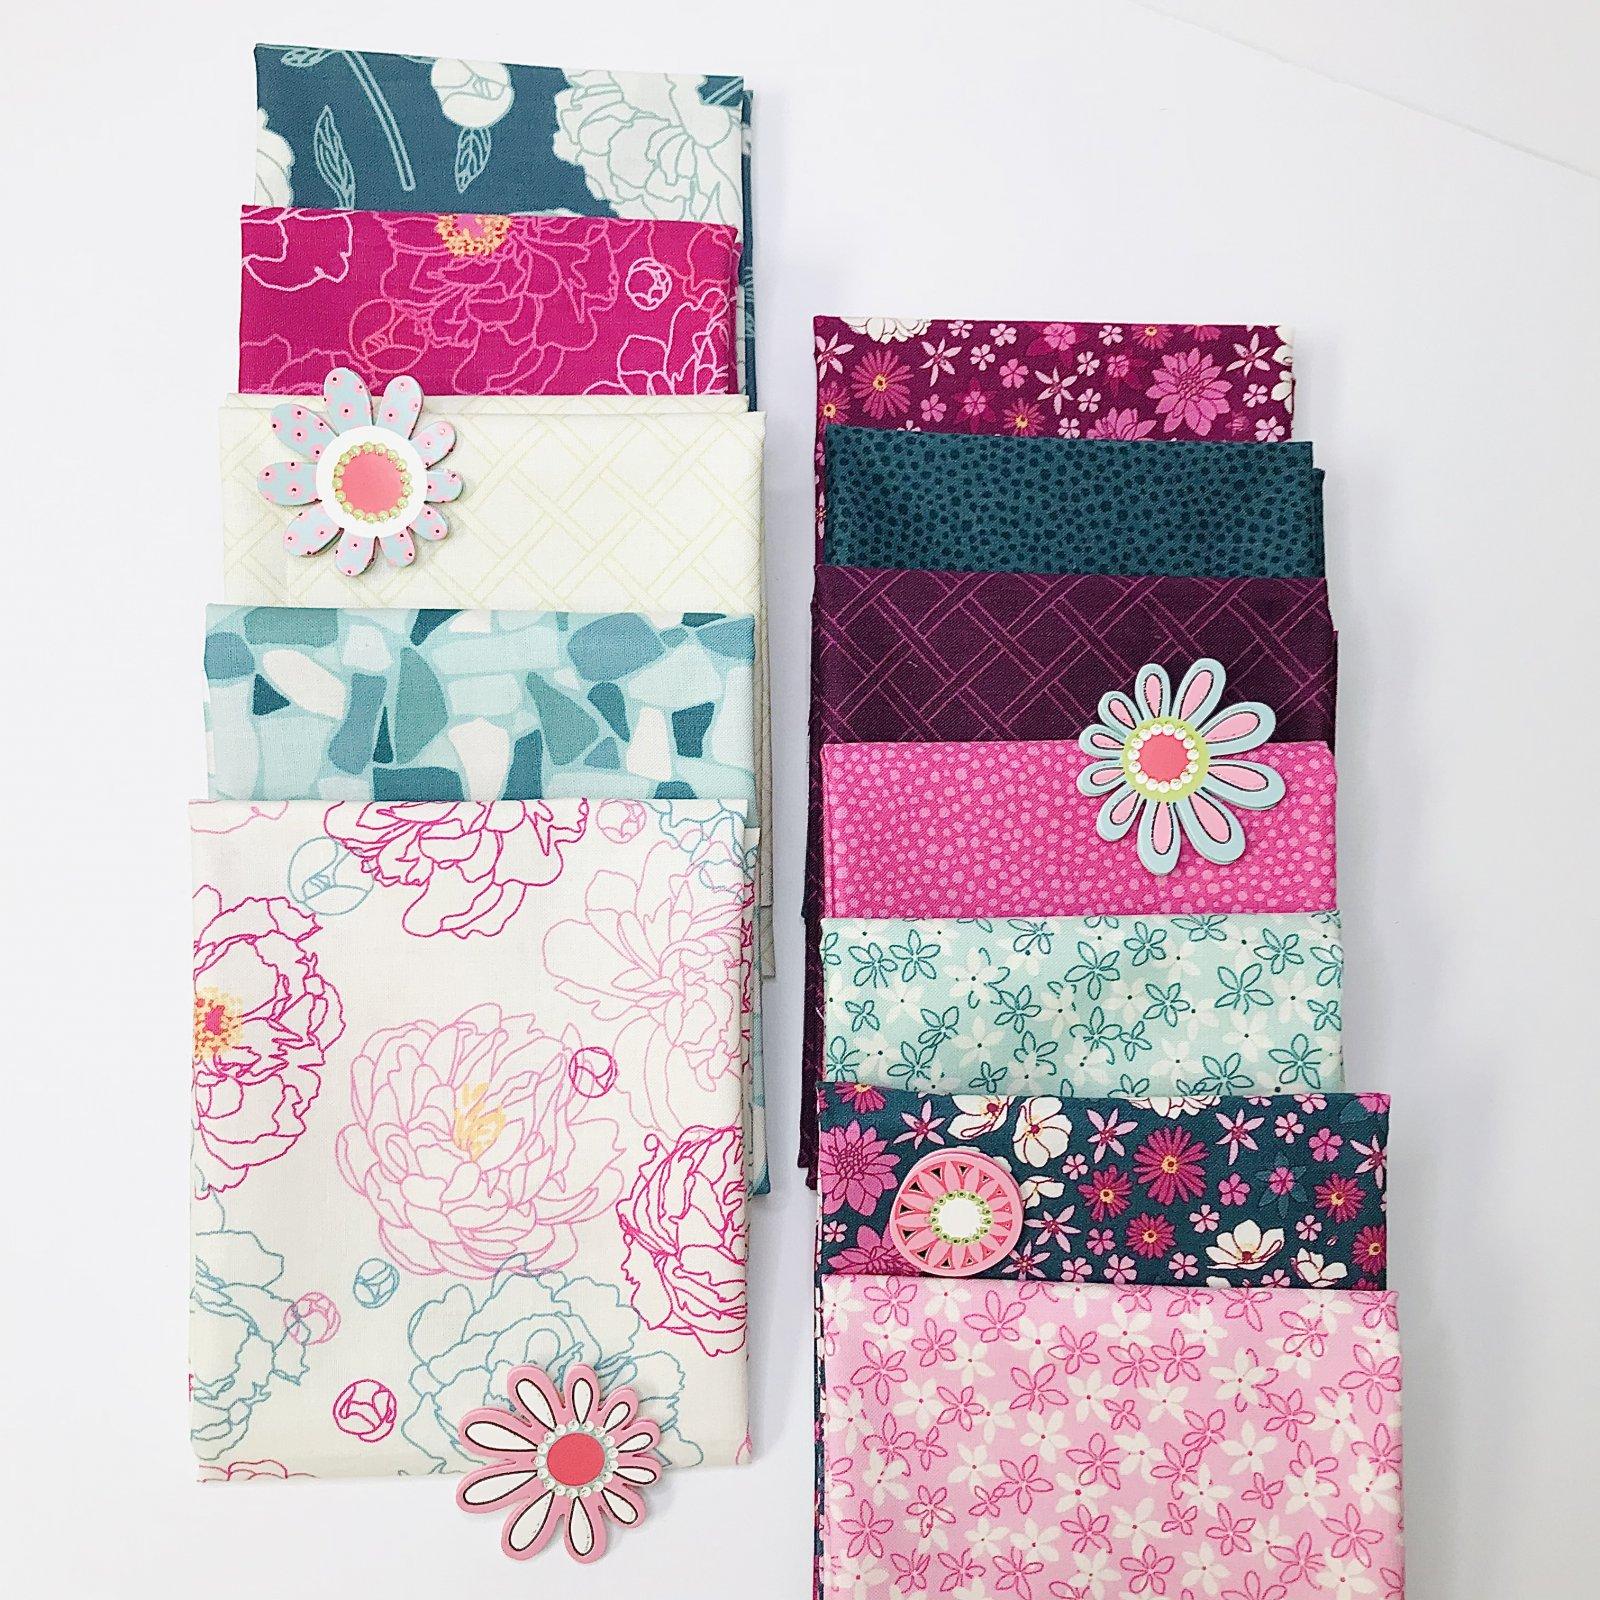 Primavera by Pippa Shaw for Figo Fabrics - Full Collection Bundles